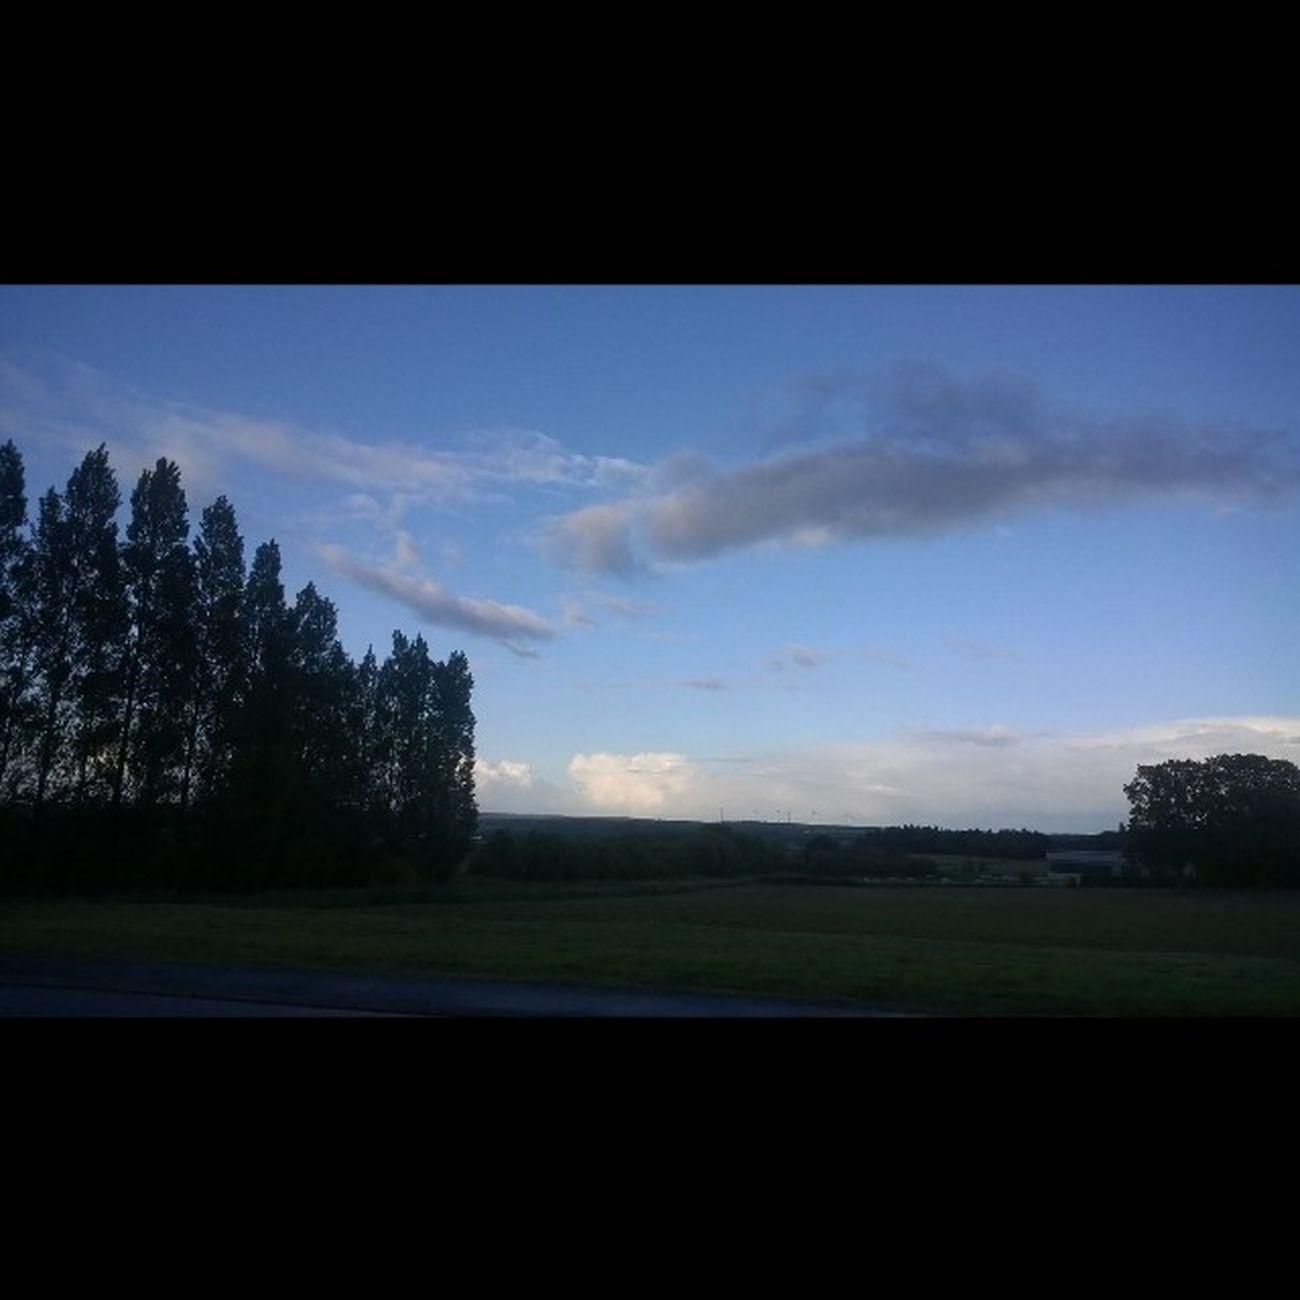 A beautiful Evening Sky with some Clouds after the Rainbow Taupont Morbihan Miamorbihan Bretagne Breizh Jaimelabretagne Fansdebretagne Arcobaleno  Nature Natura Naturelovers Naturegram Nuages Clouds Instagram